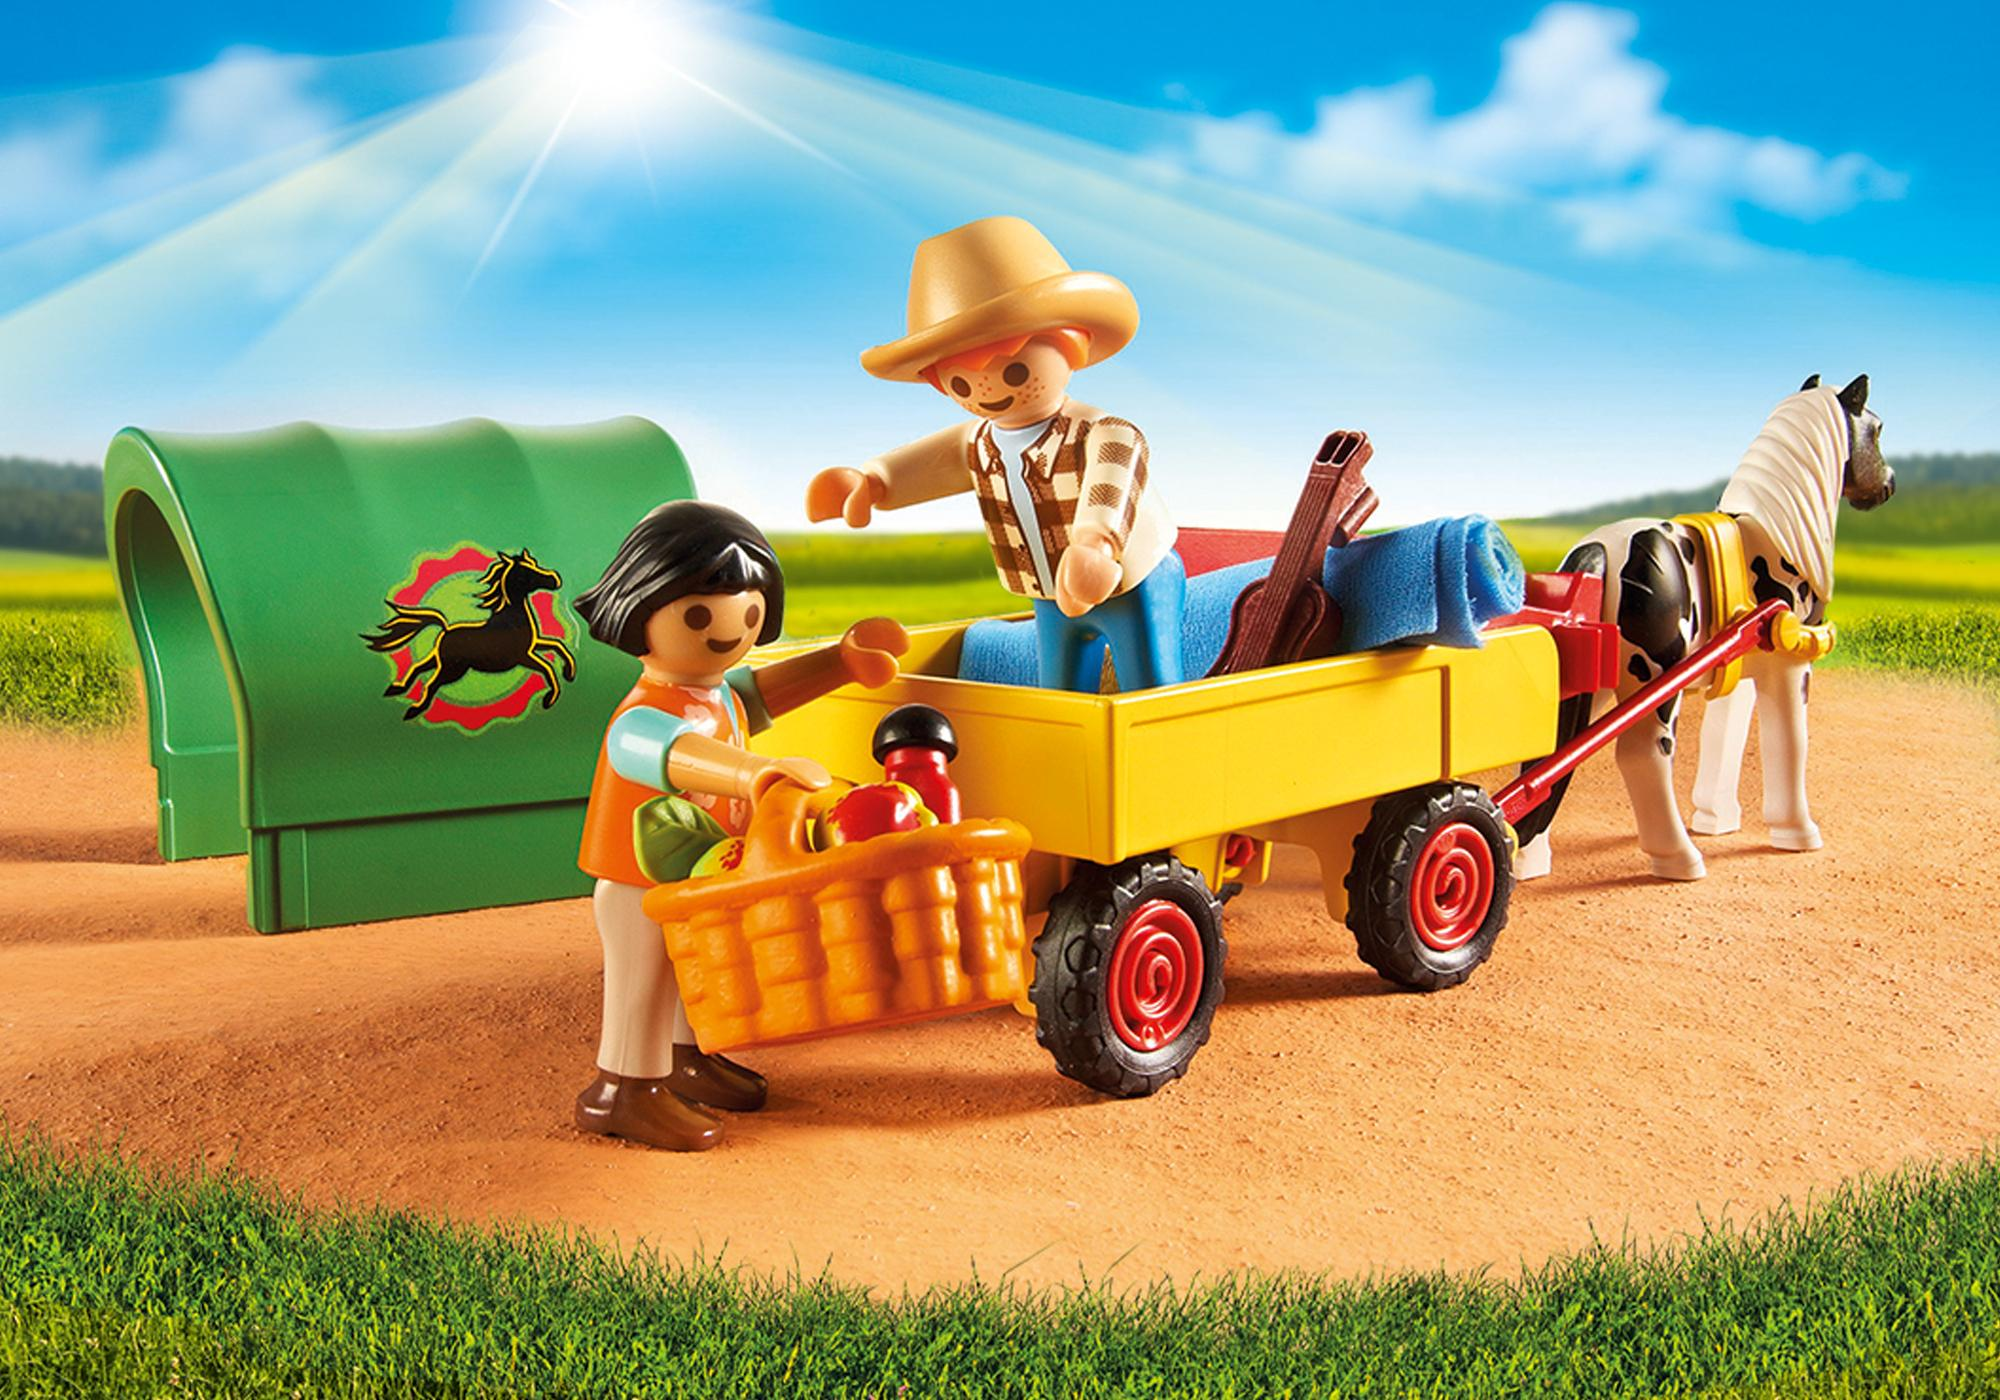 http://media.playmobil.com/i/playmobil/5686_product_extra1/Picnic with Pony Wagon